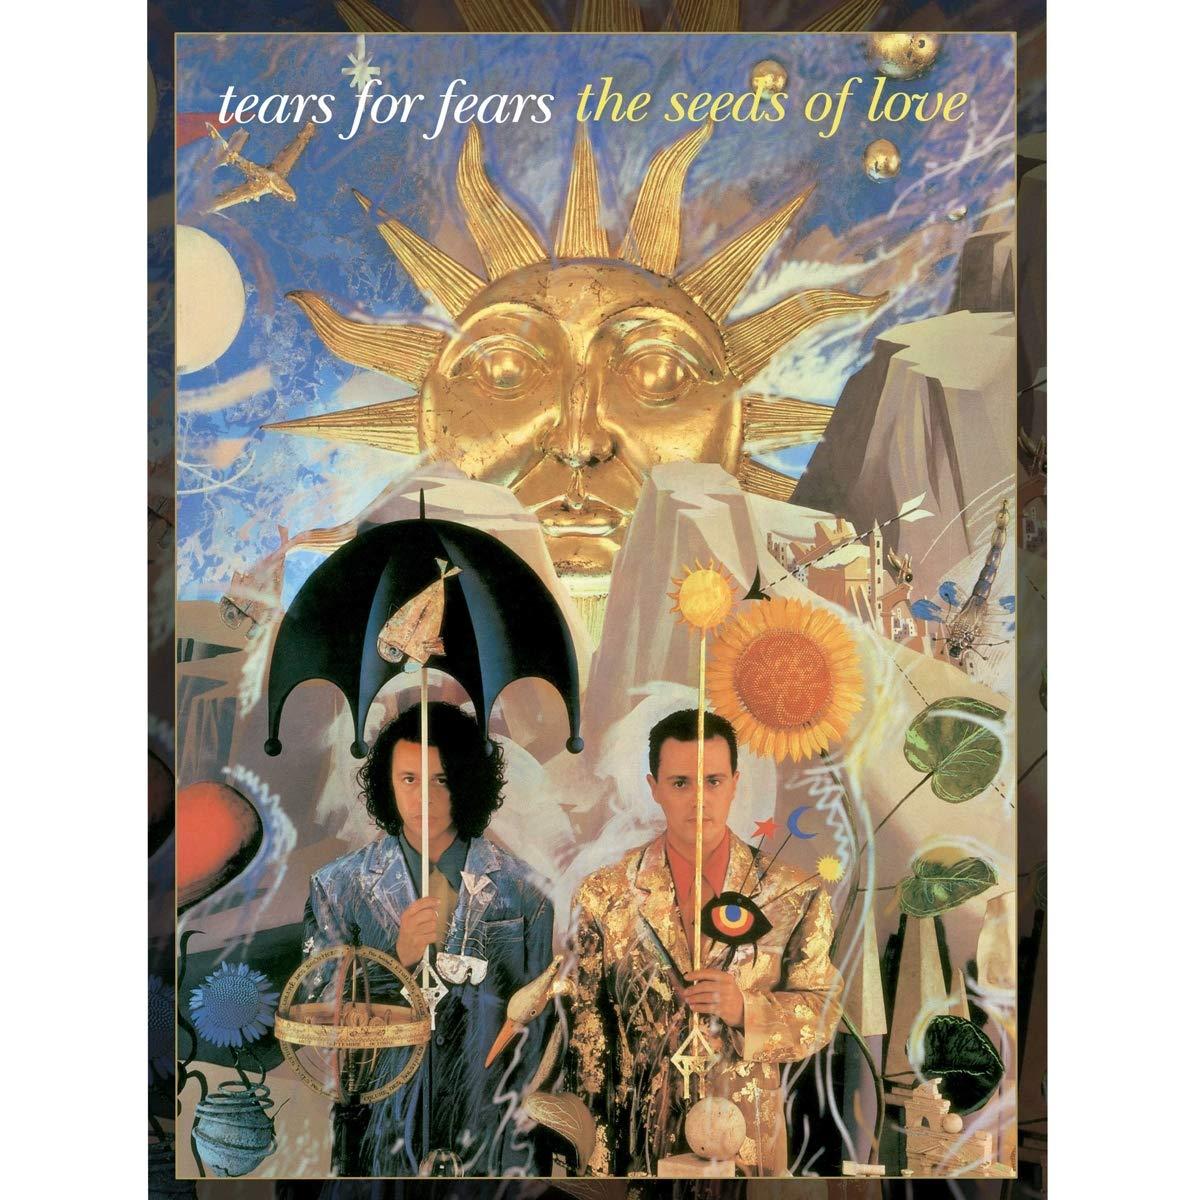 The Seeds Of Love [4CD/Blu-ray Box Set]